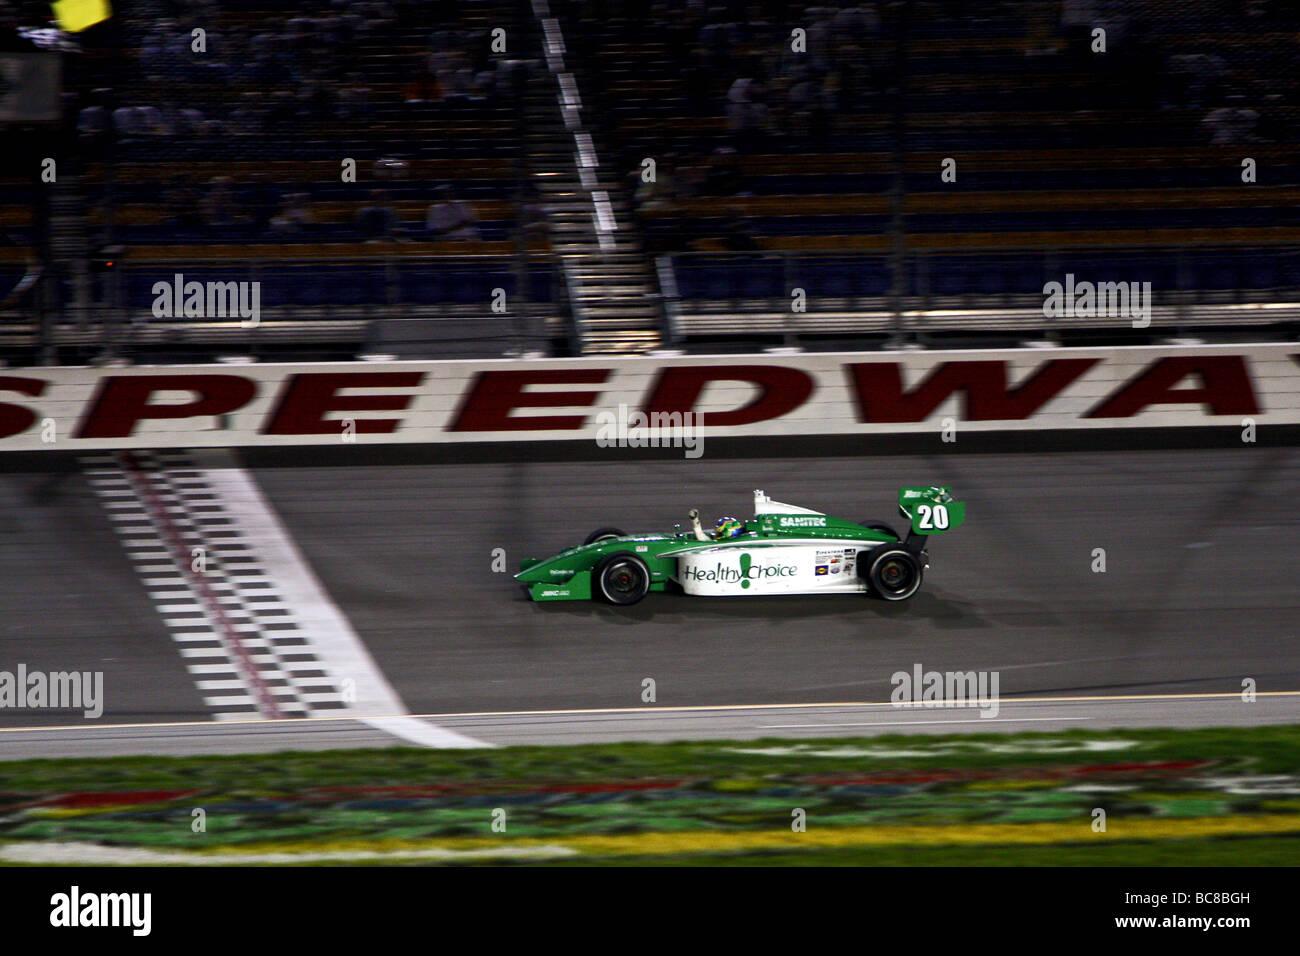 Indy Lights Race Series Stock Photo